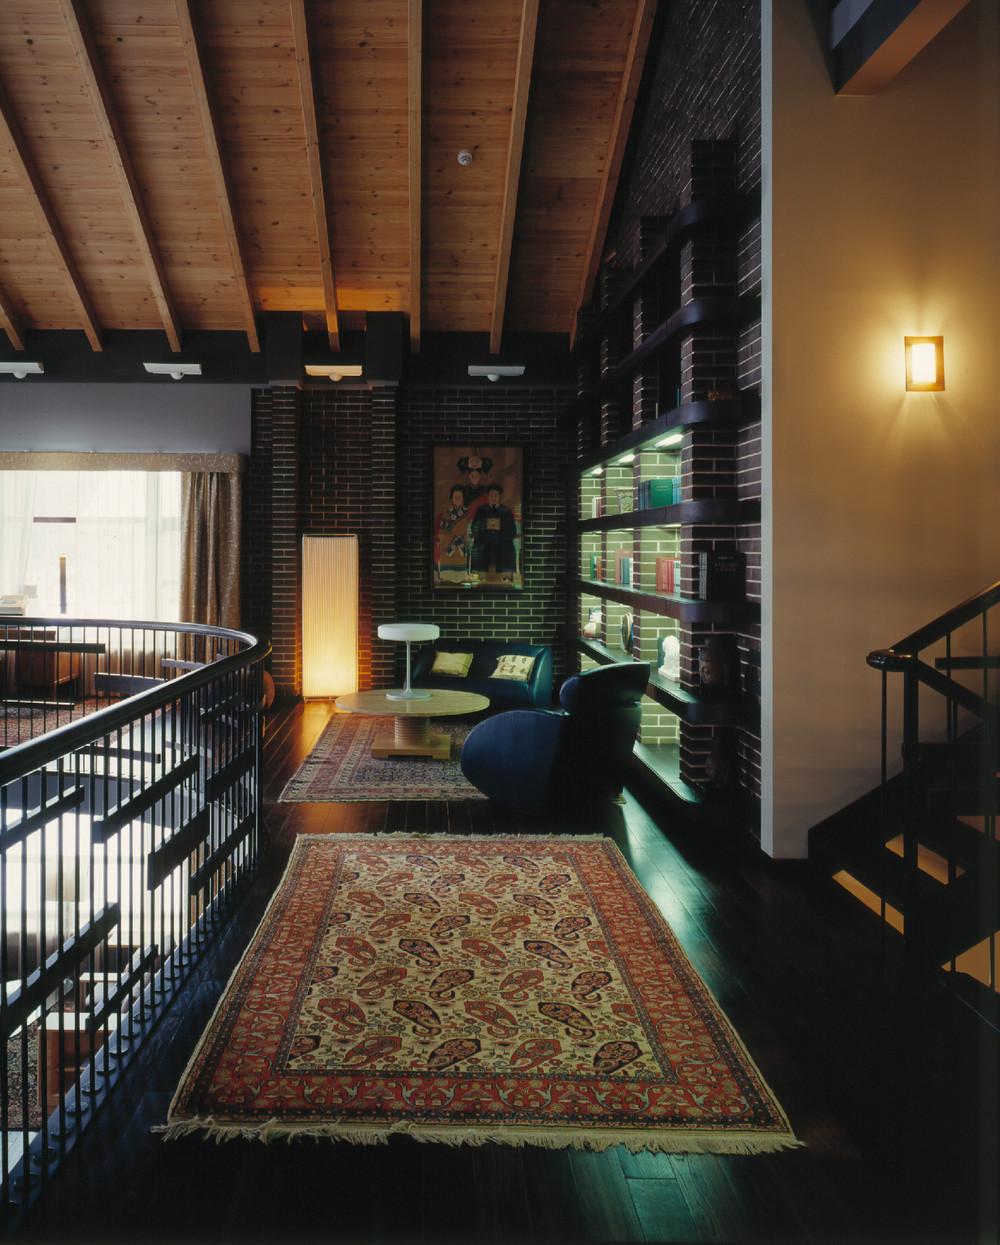 Интерьер жилого дома Галерея 3dddru: Интерьер загородного жилого дома, автор Арсений/Leonovich